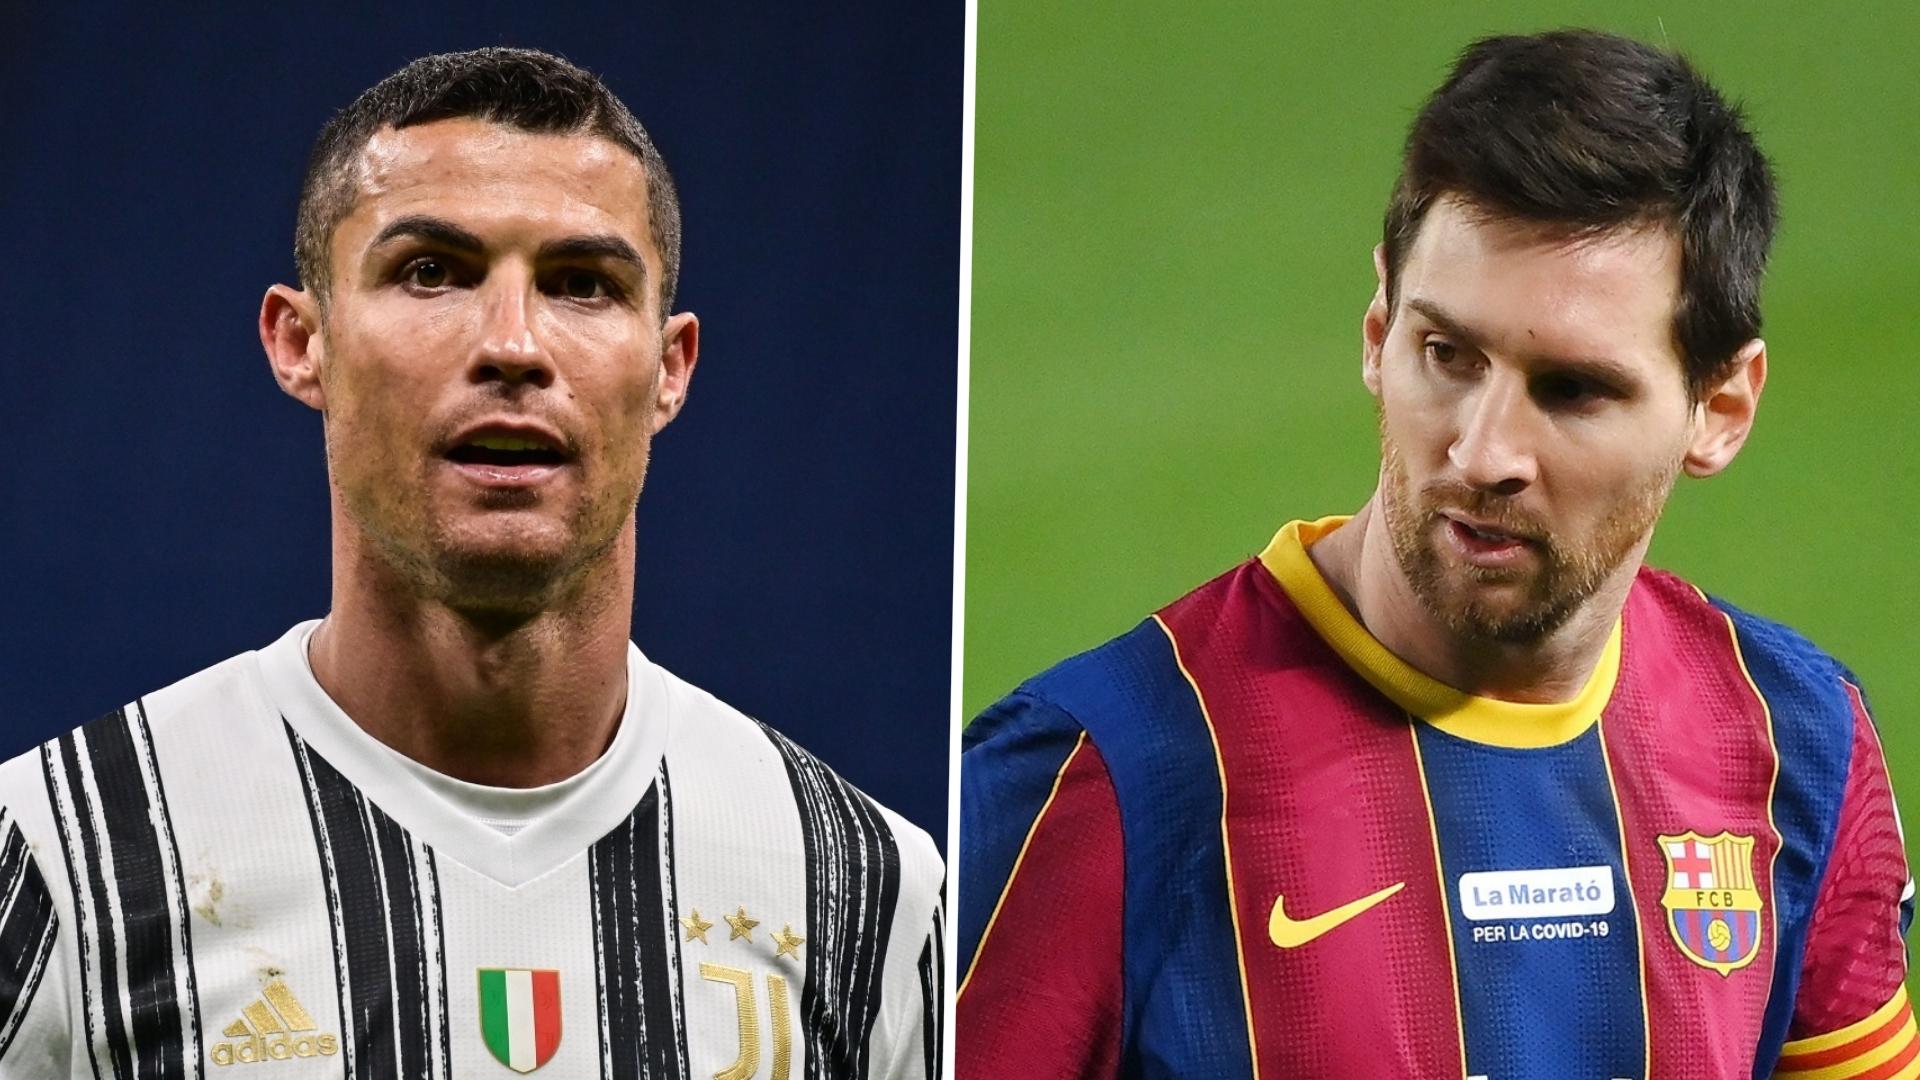 Ronaldo or Messi - who has scored more goals?